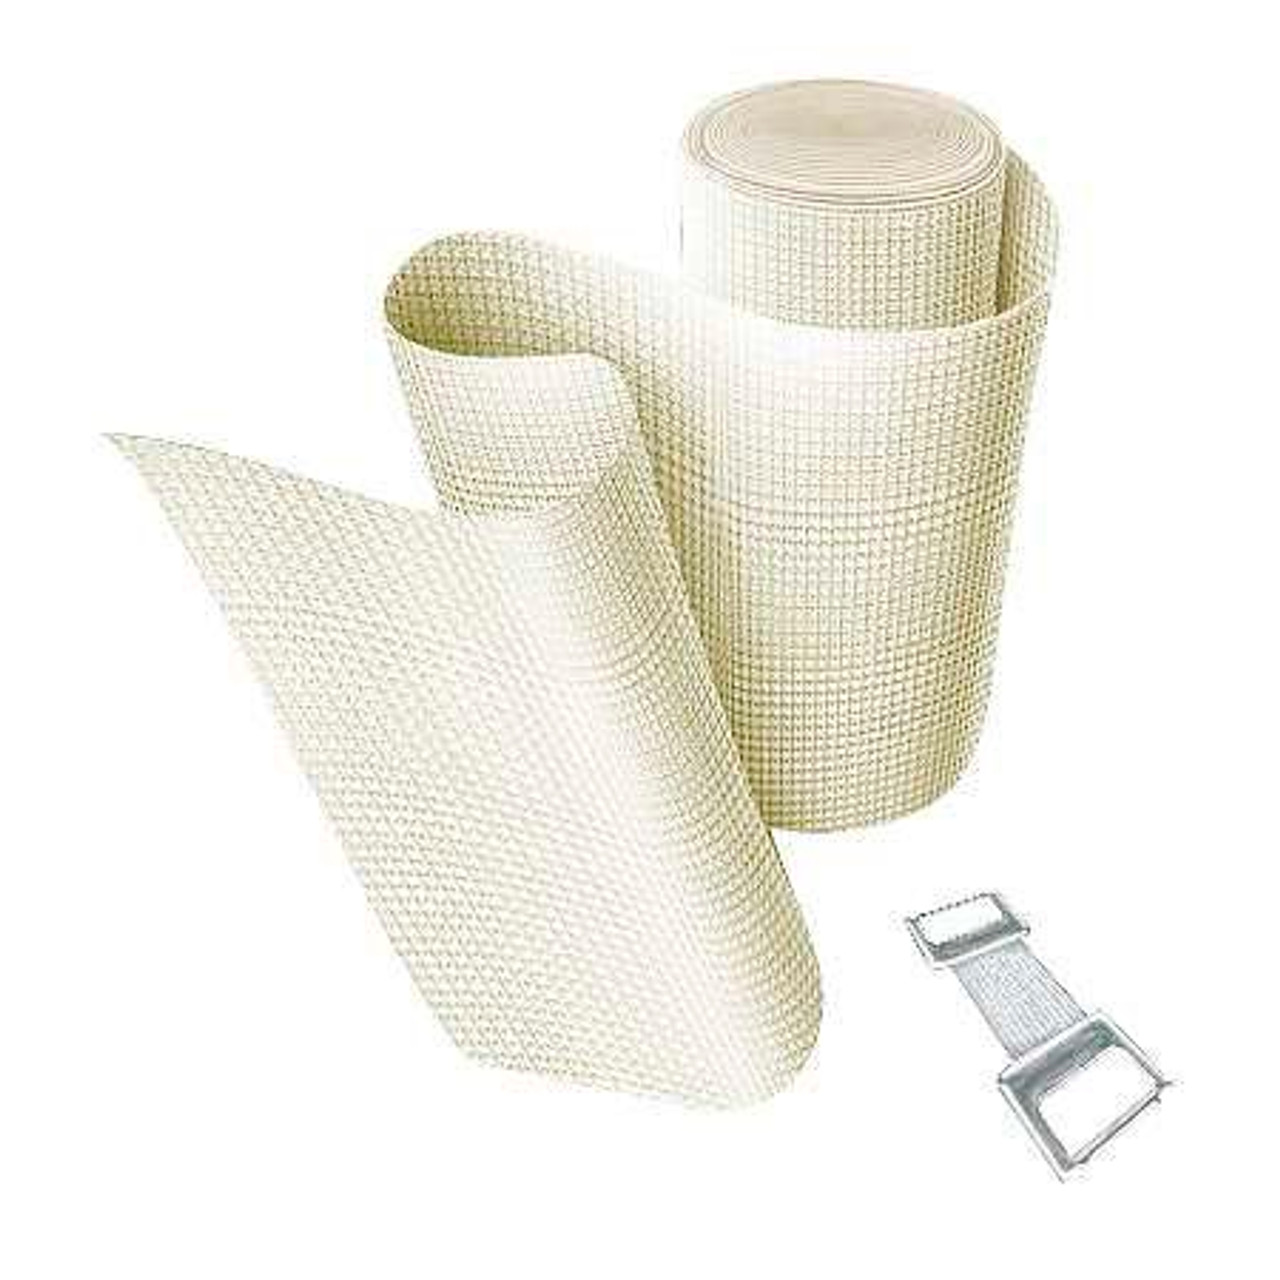 Flexa Elast Universal Elastic Bandage With Clip Israeli First Aid